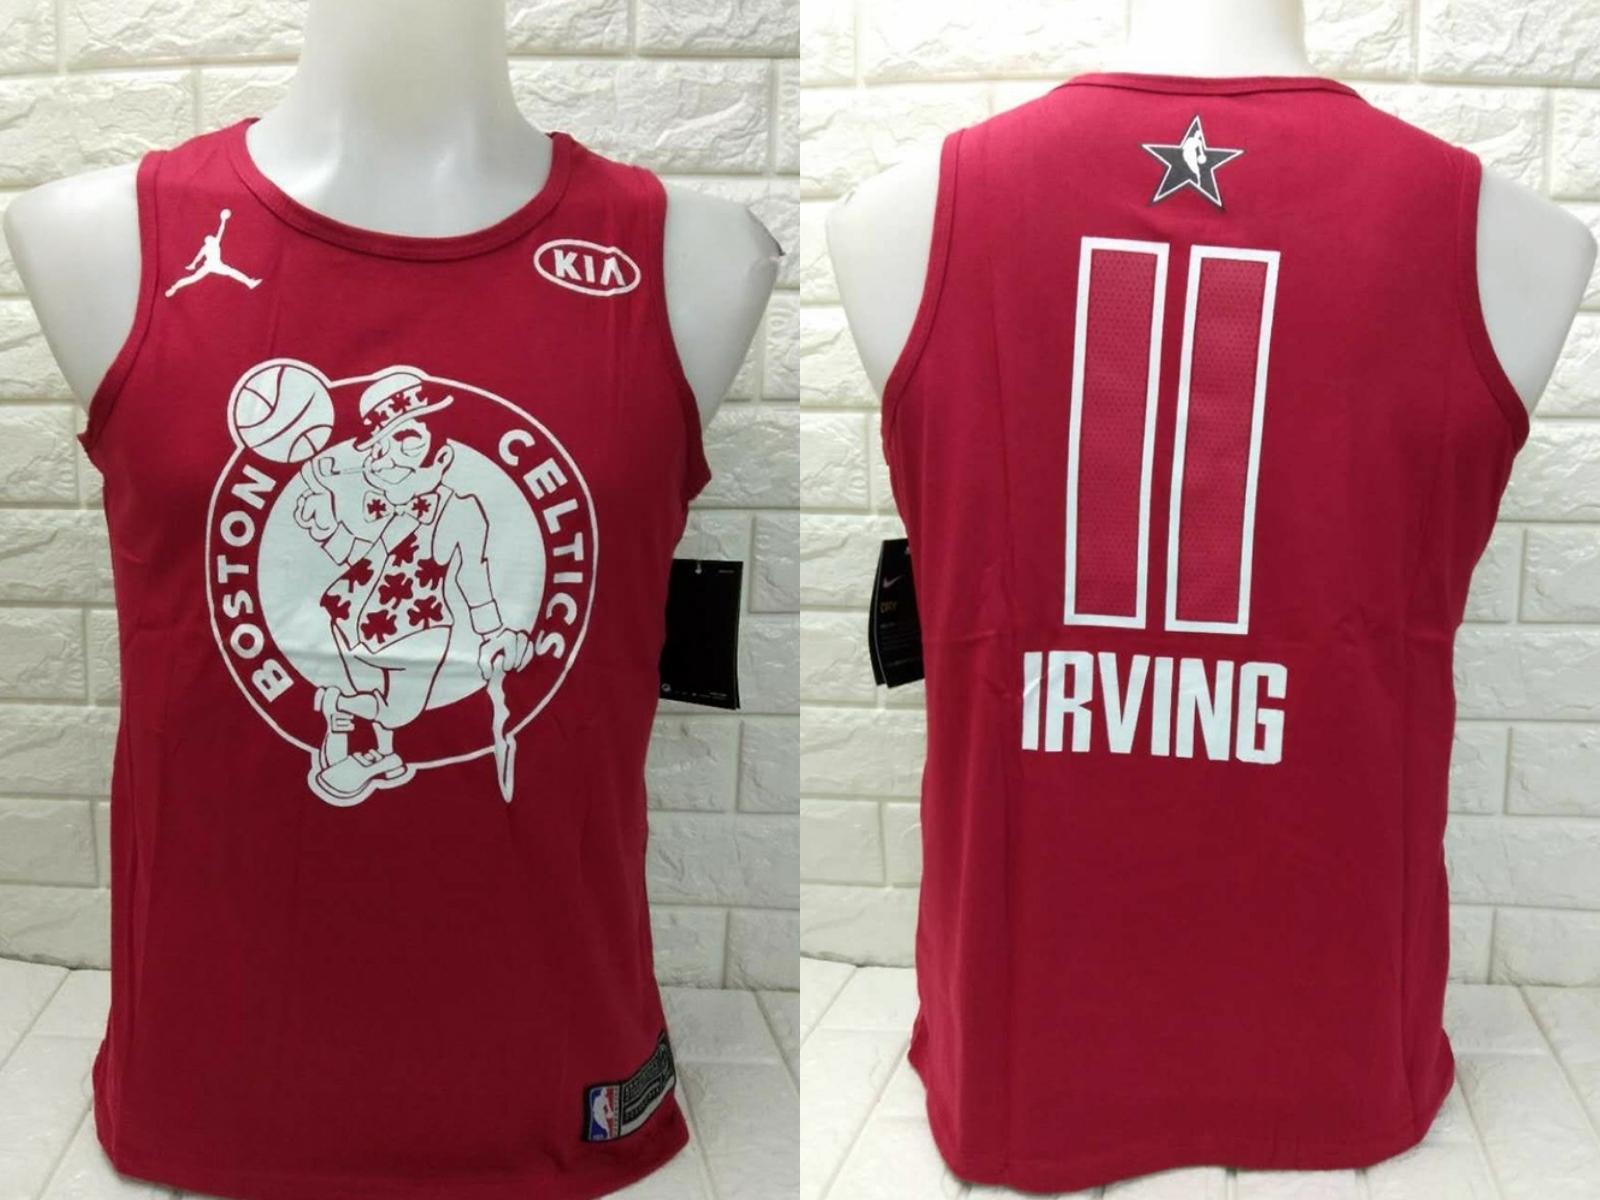 1990128c2a6 Basketball Jerseys for sale - Mens Basketball Jersey online brands ...